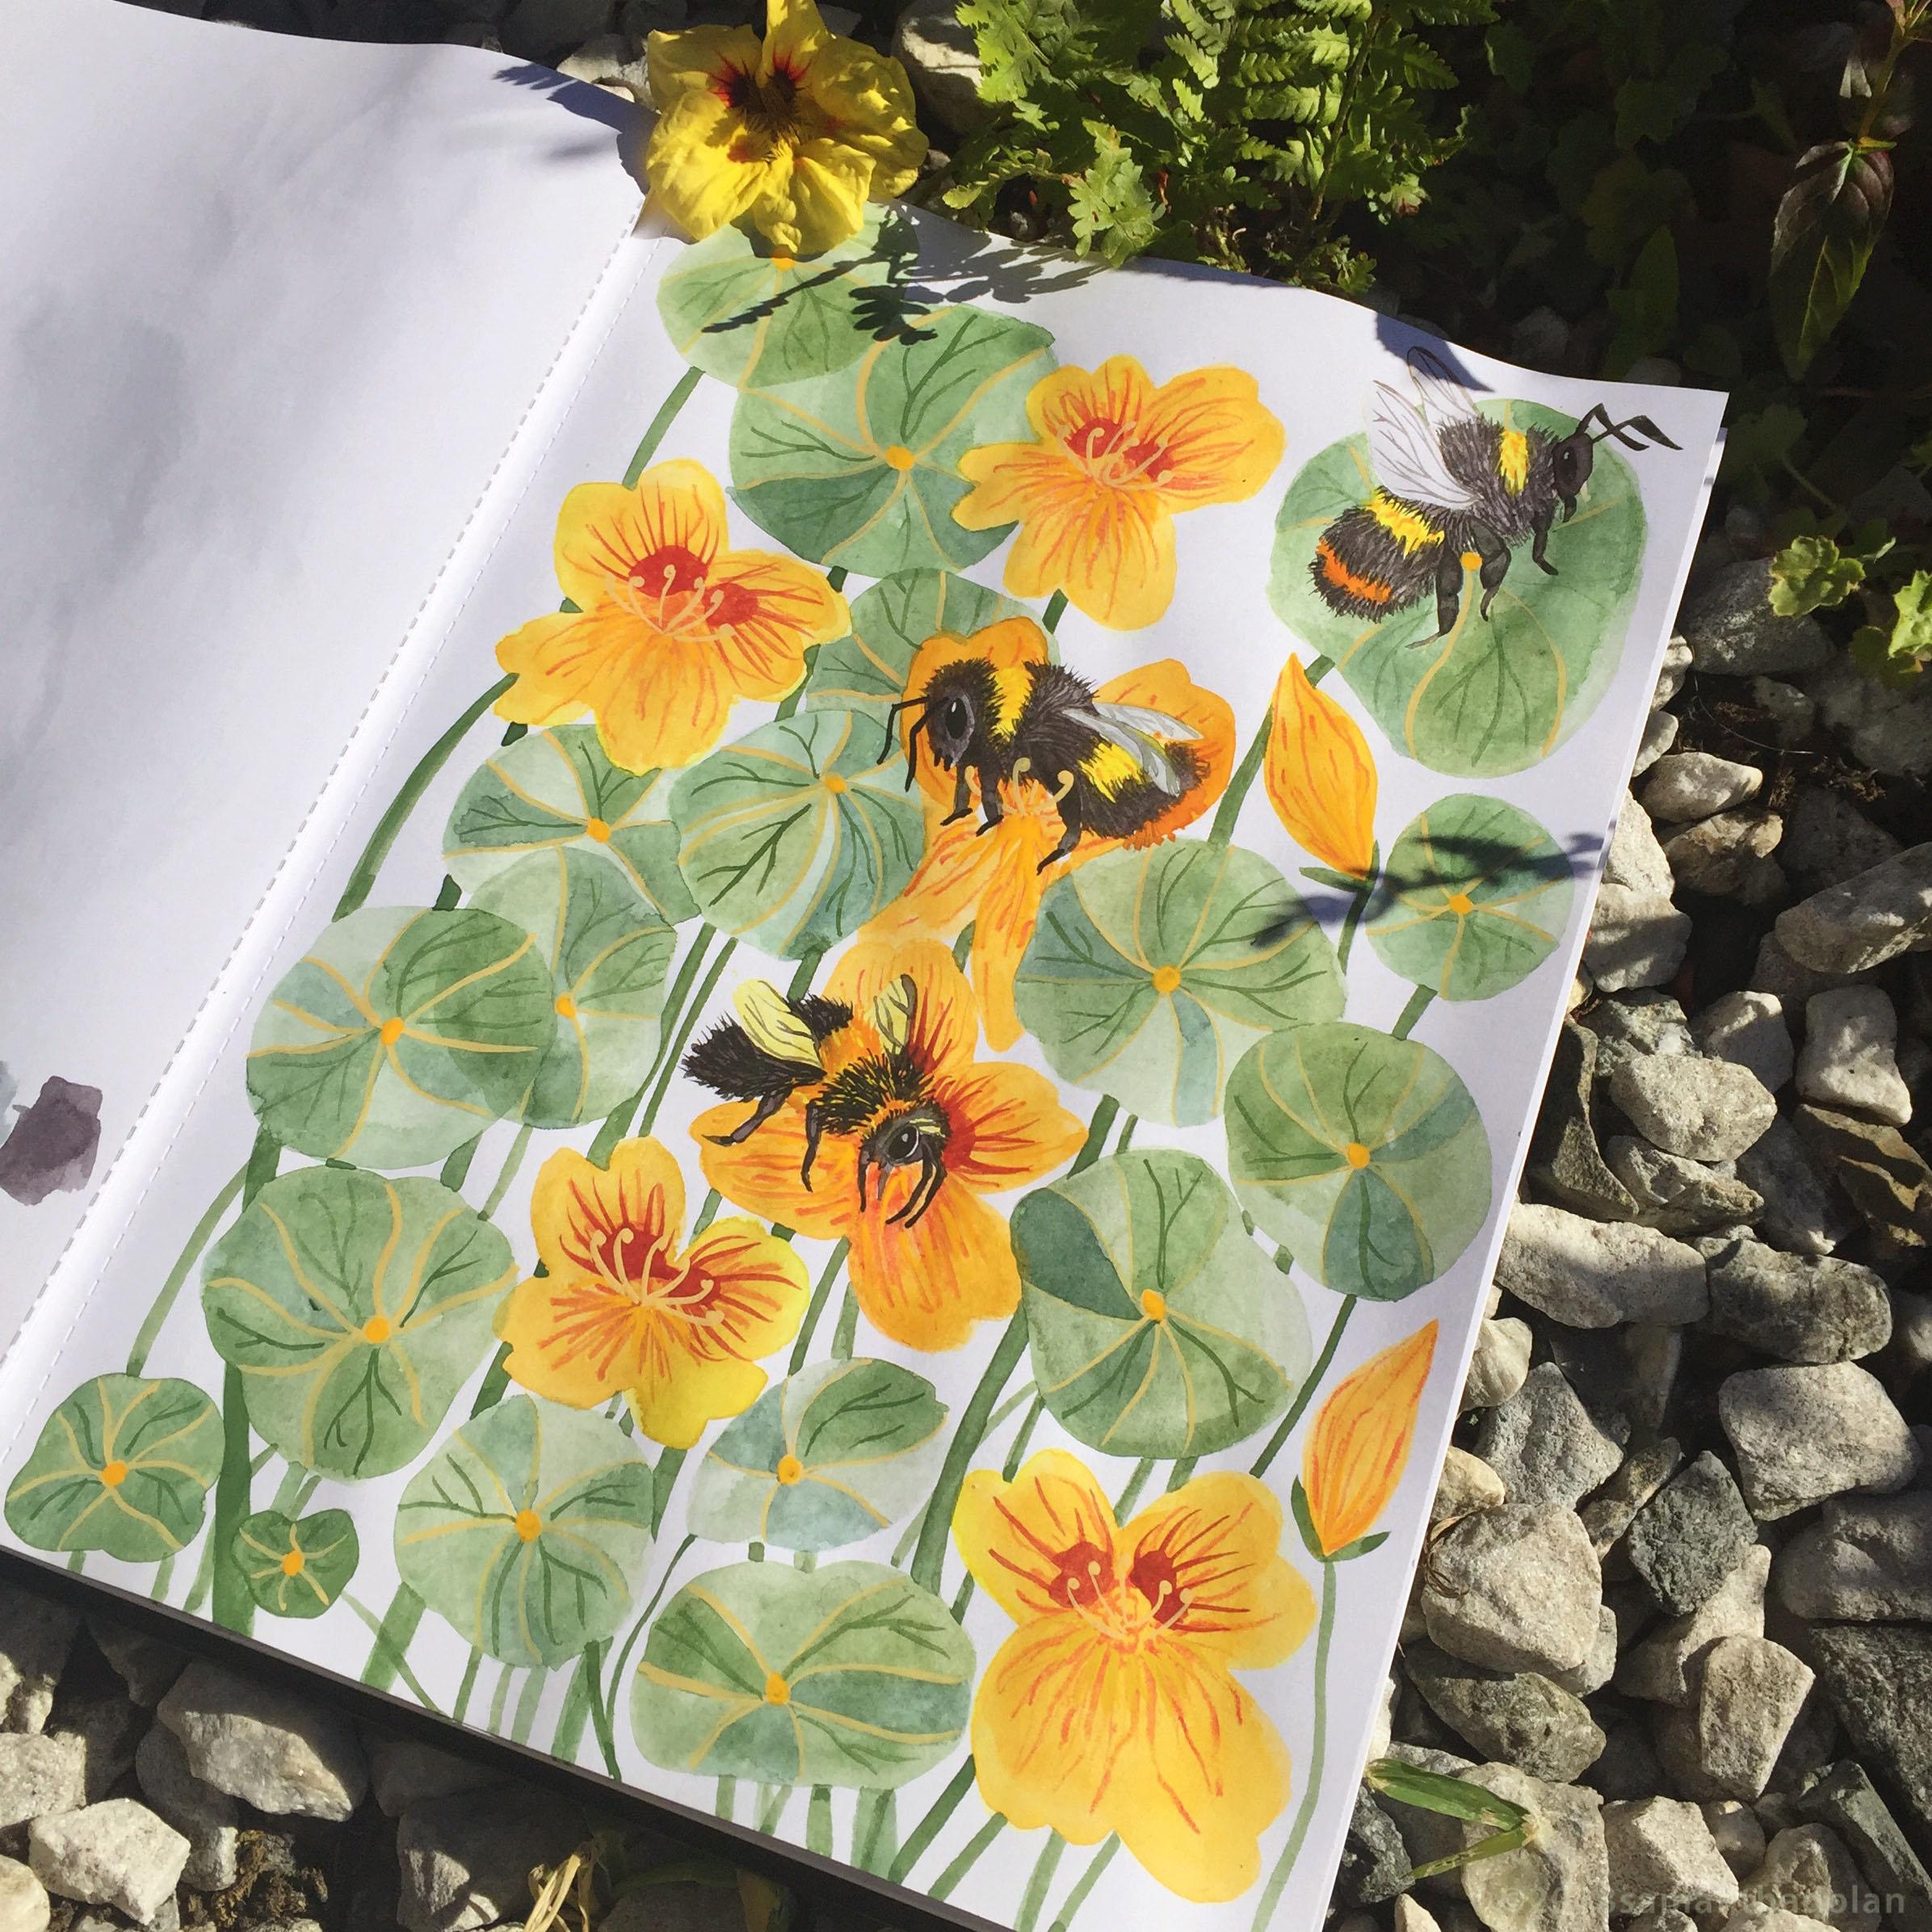 Bumble Bees, watercolour, gouache and pencil, June Sketchbook.